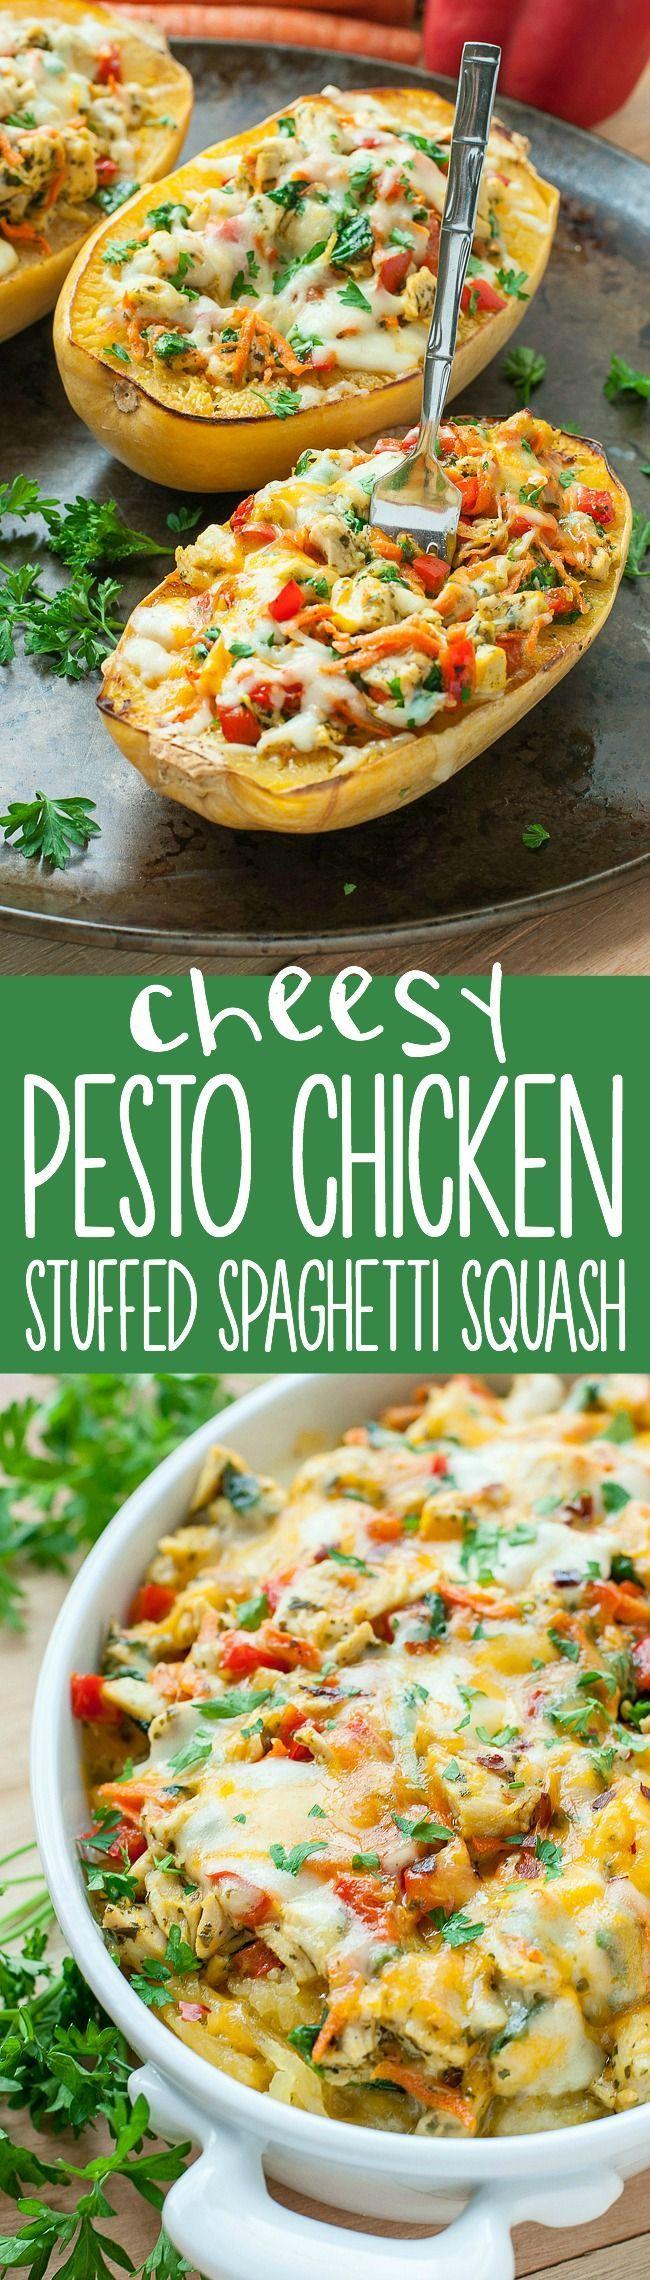 Cheesy Pesto Chicken and Veggie Stuffed Spaghetti Squash by Pea and Crayons